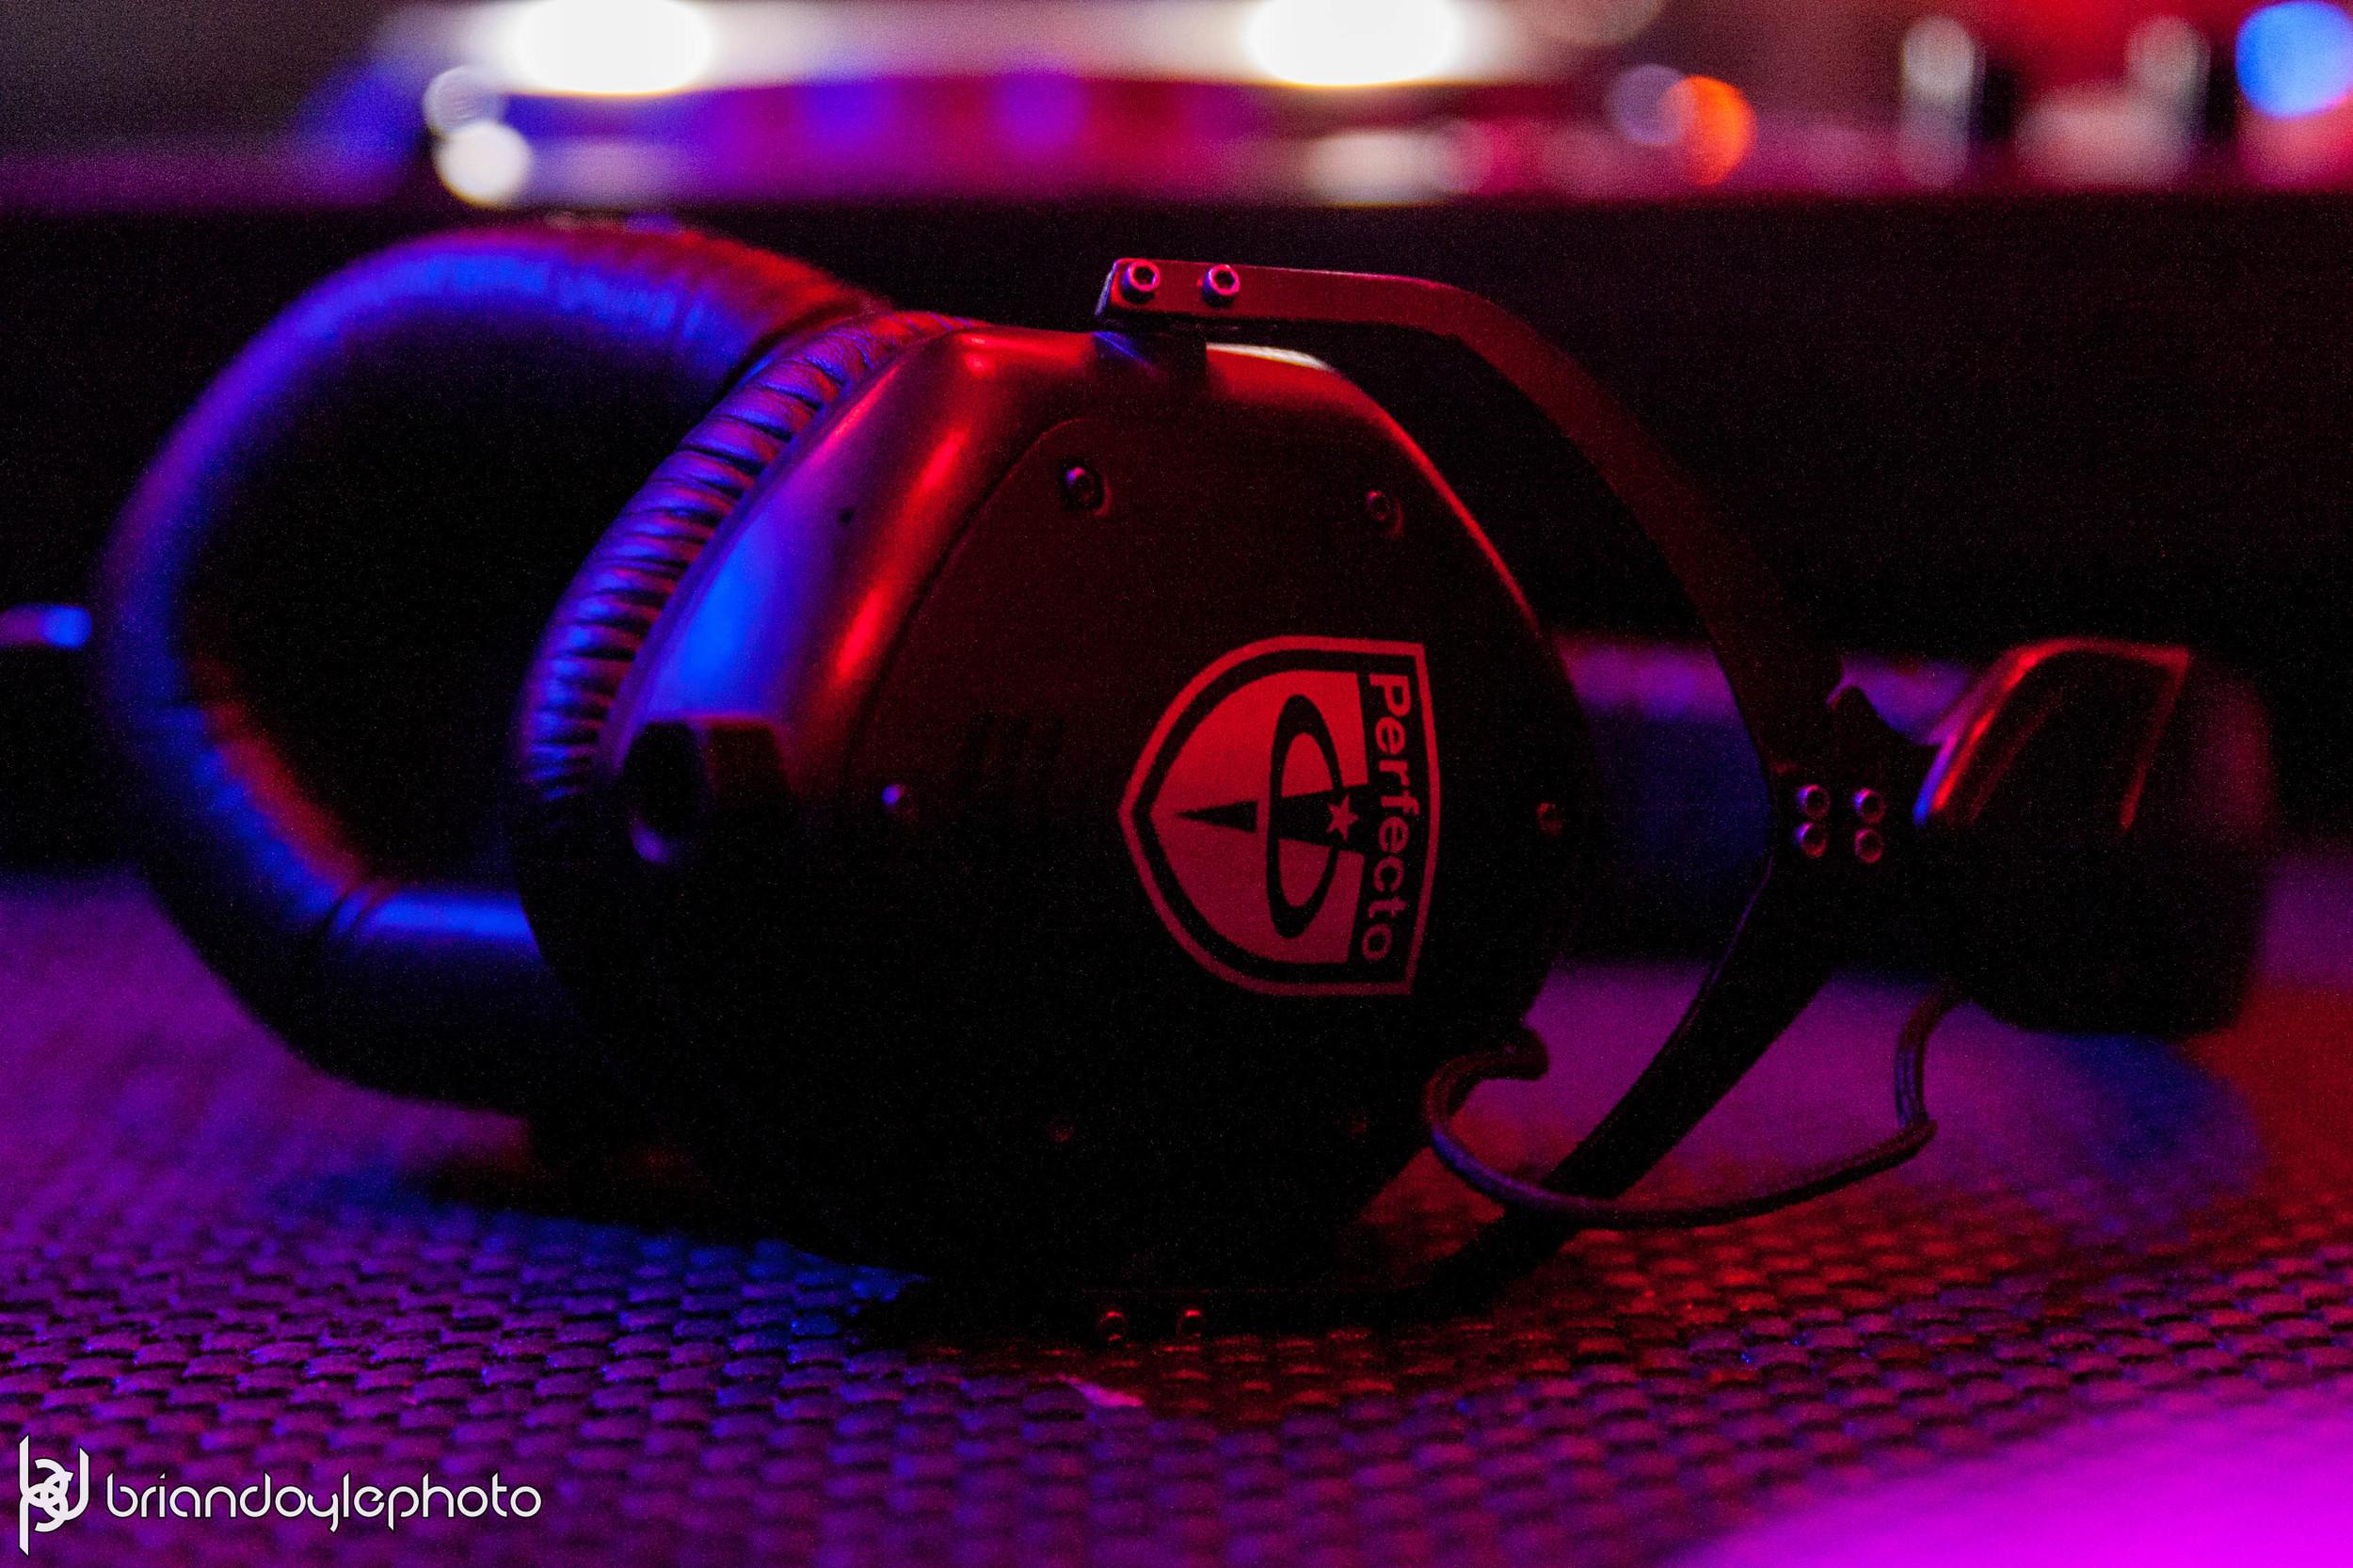 Jagermeister Presents - Paul Oakenfold @ Avalon bdp 27.09.14-41.jpg